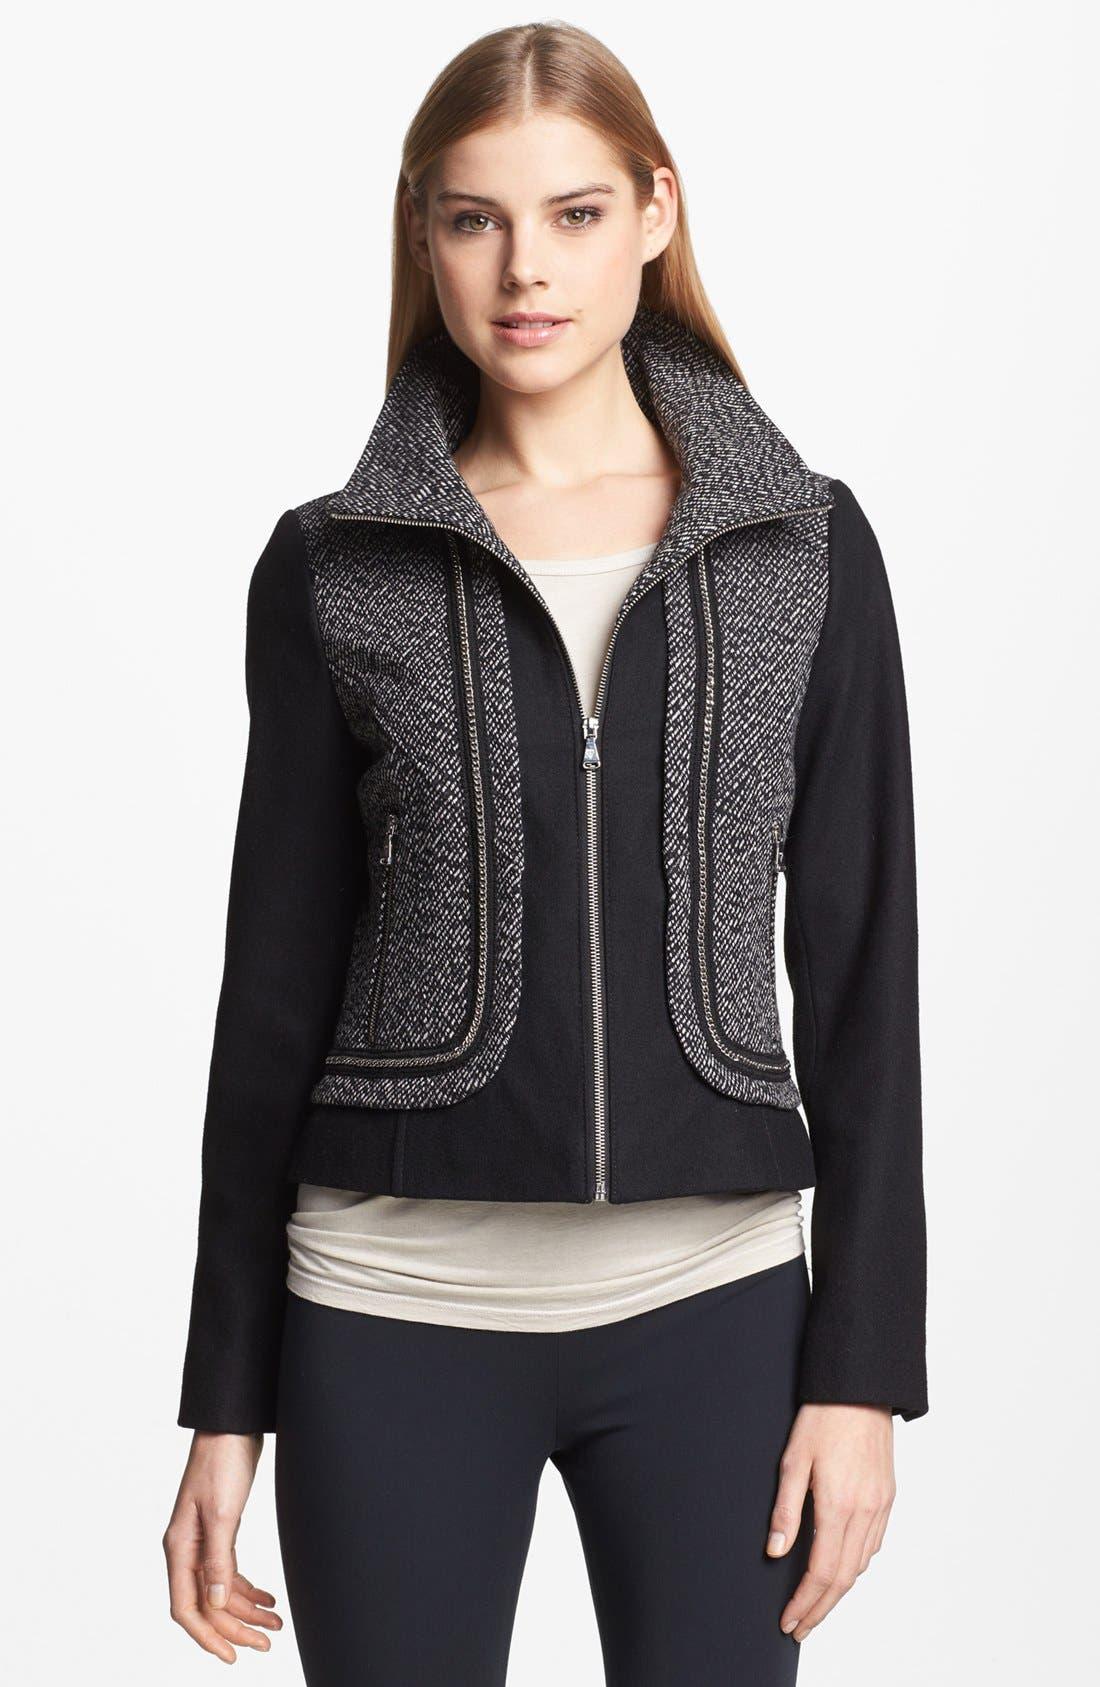 Alternate Image 1 Selected - GUESS Zip Front Mixed Media Jacket (Regular & Petite)